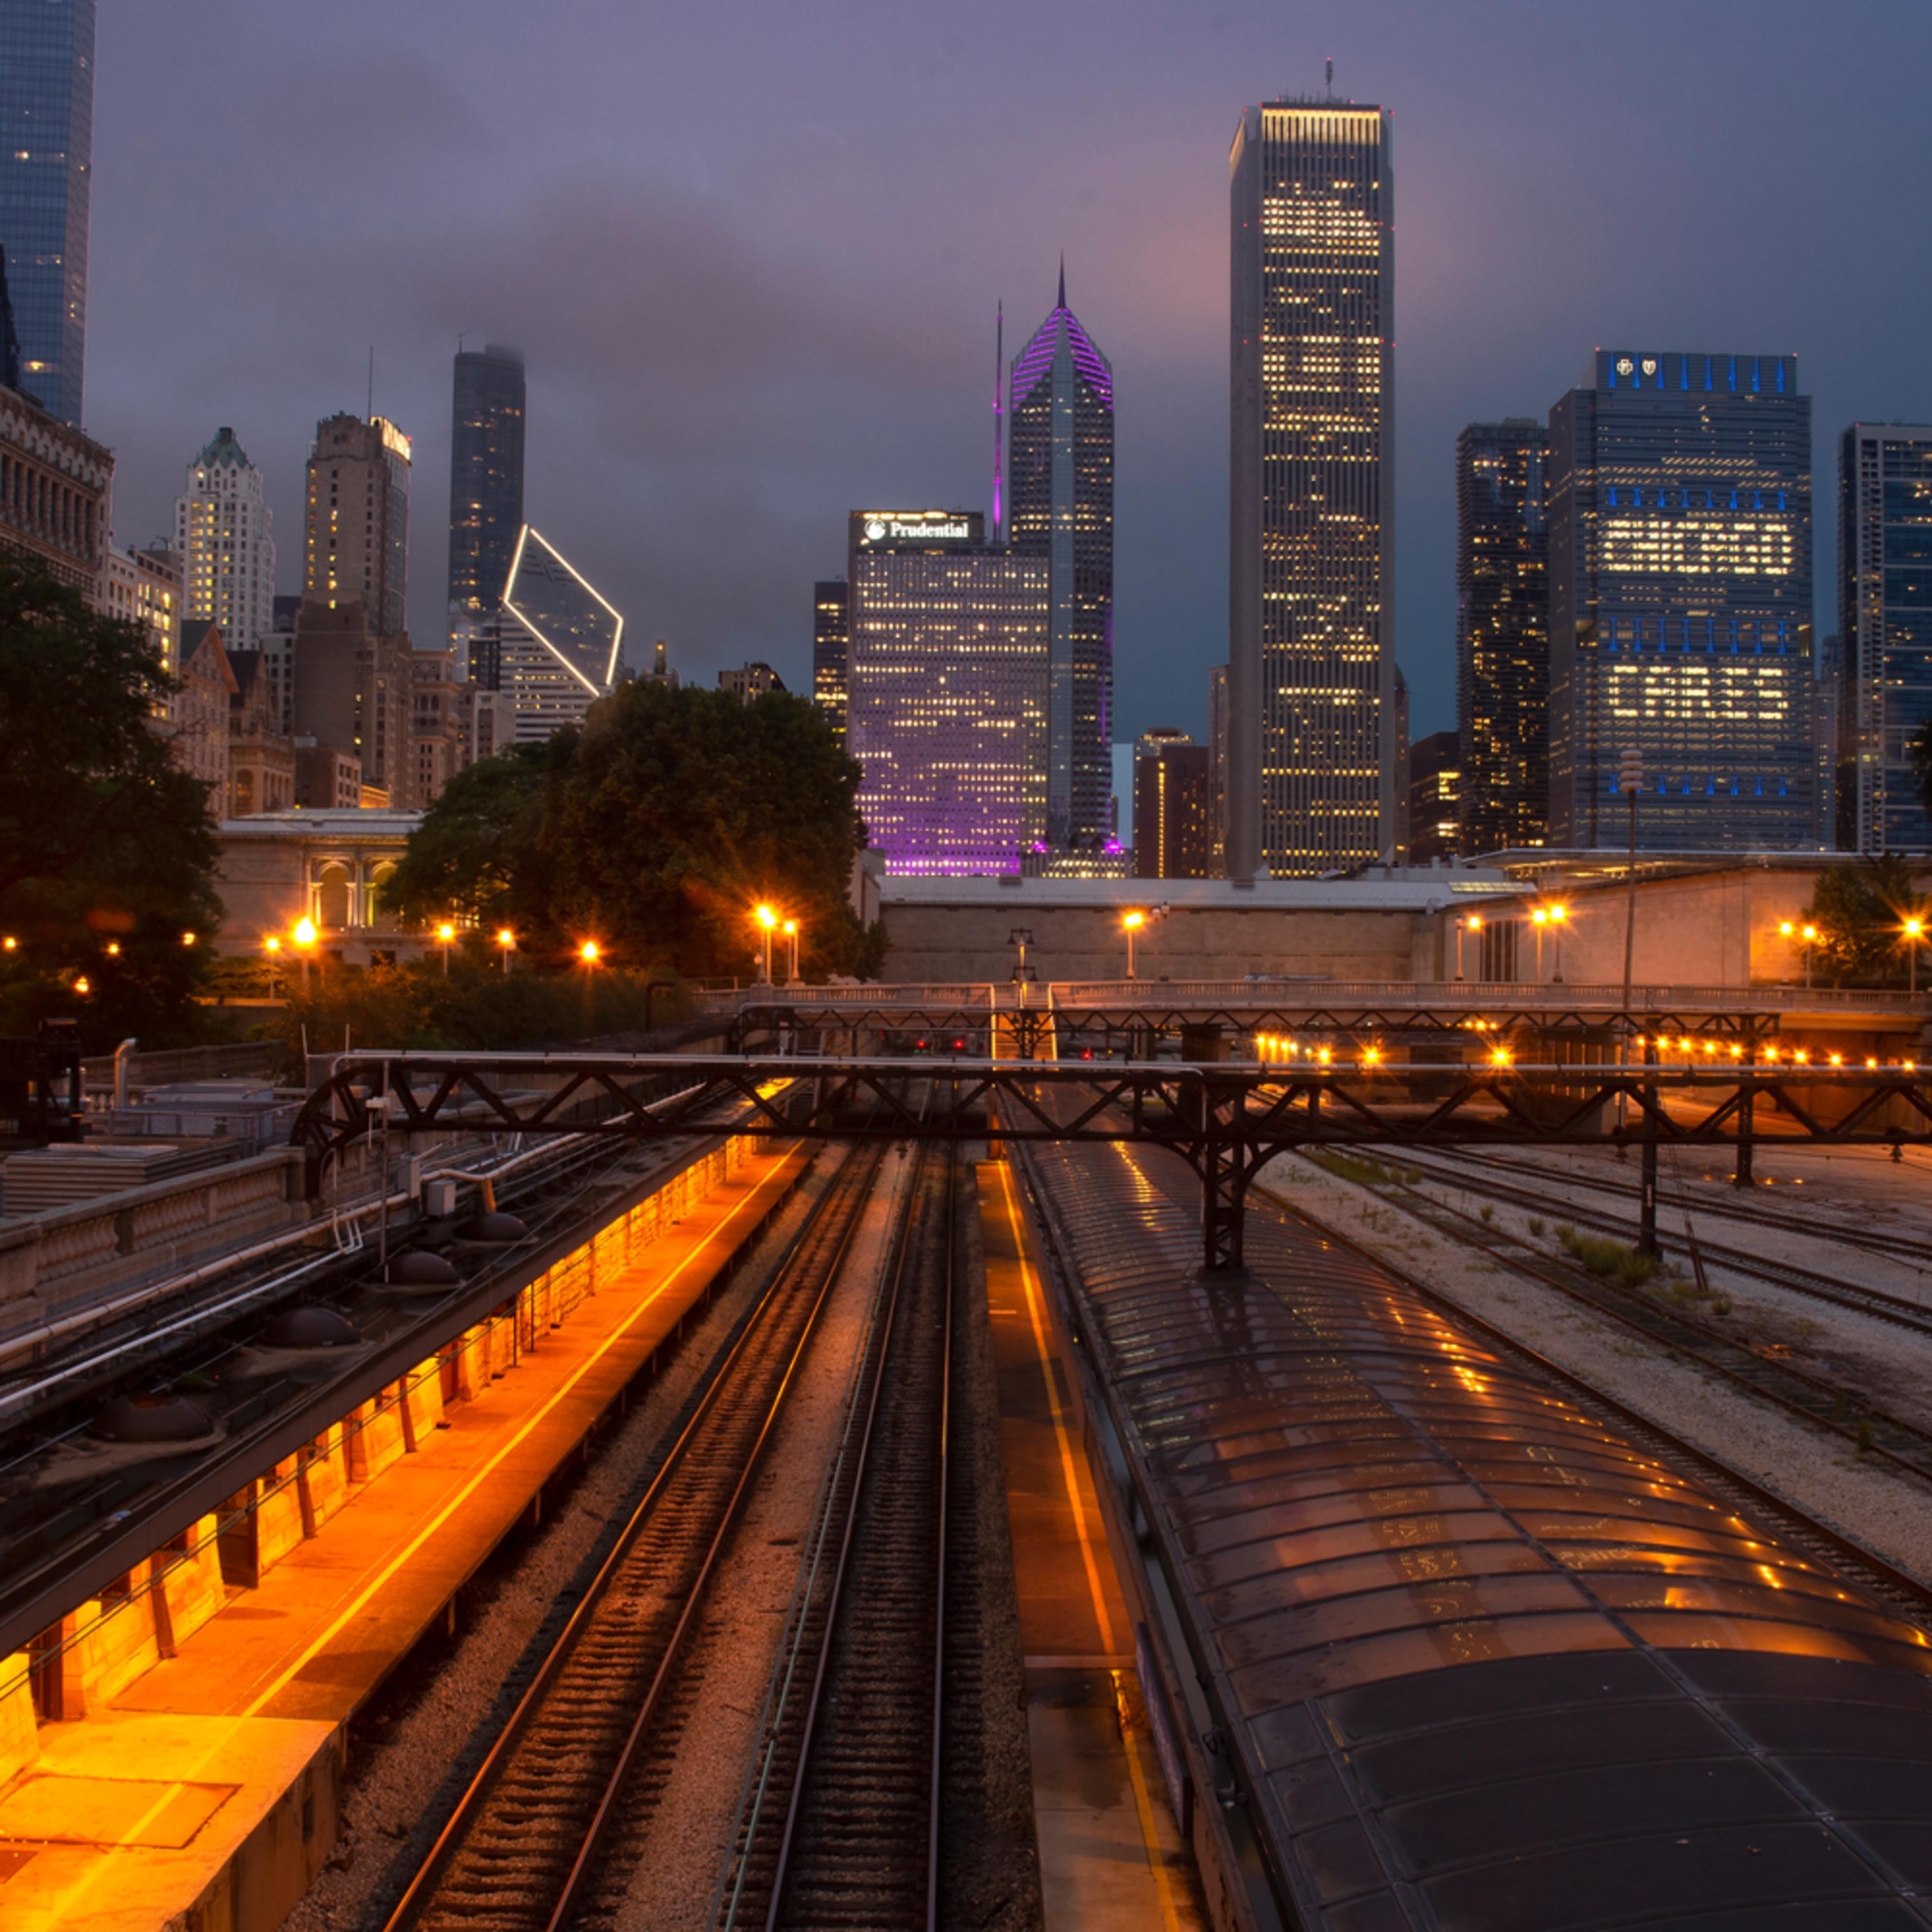 180622 chicago twilight 038 2 h2ubj2